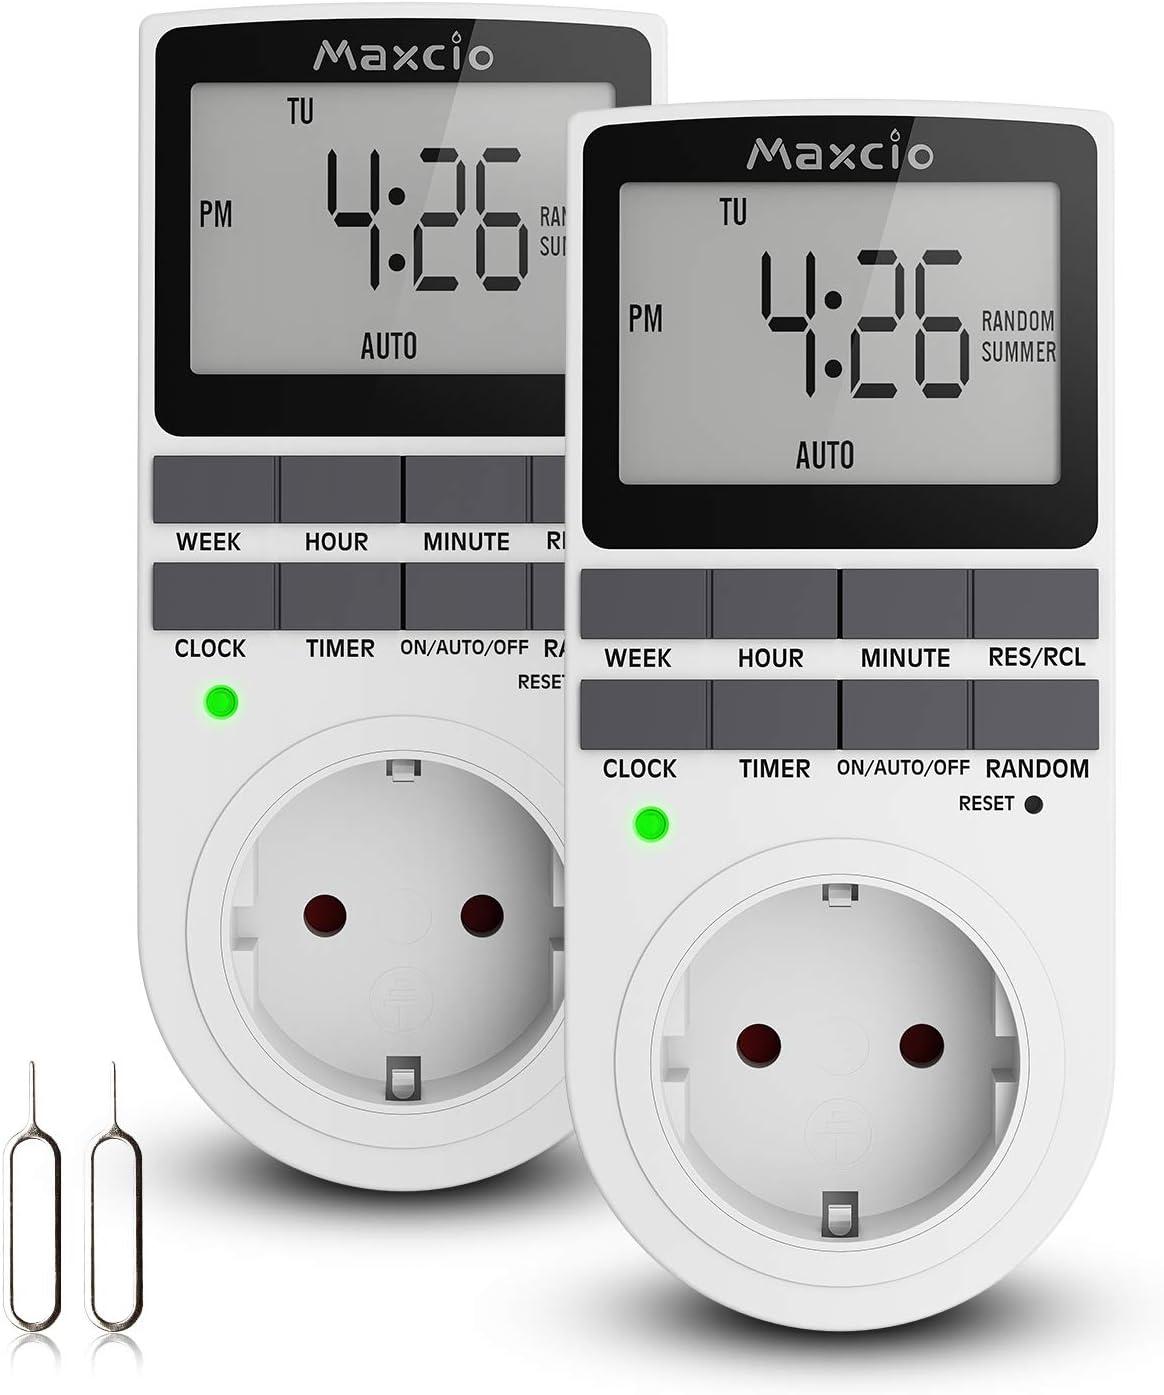 Temporizador Enchufe Digital Programable, Maxcio Programador Enchufe Semanal 12/24 Horario de Verano Modo Aleatorio Ahorrar Energía (2 Packs)